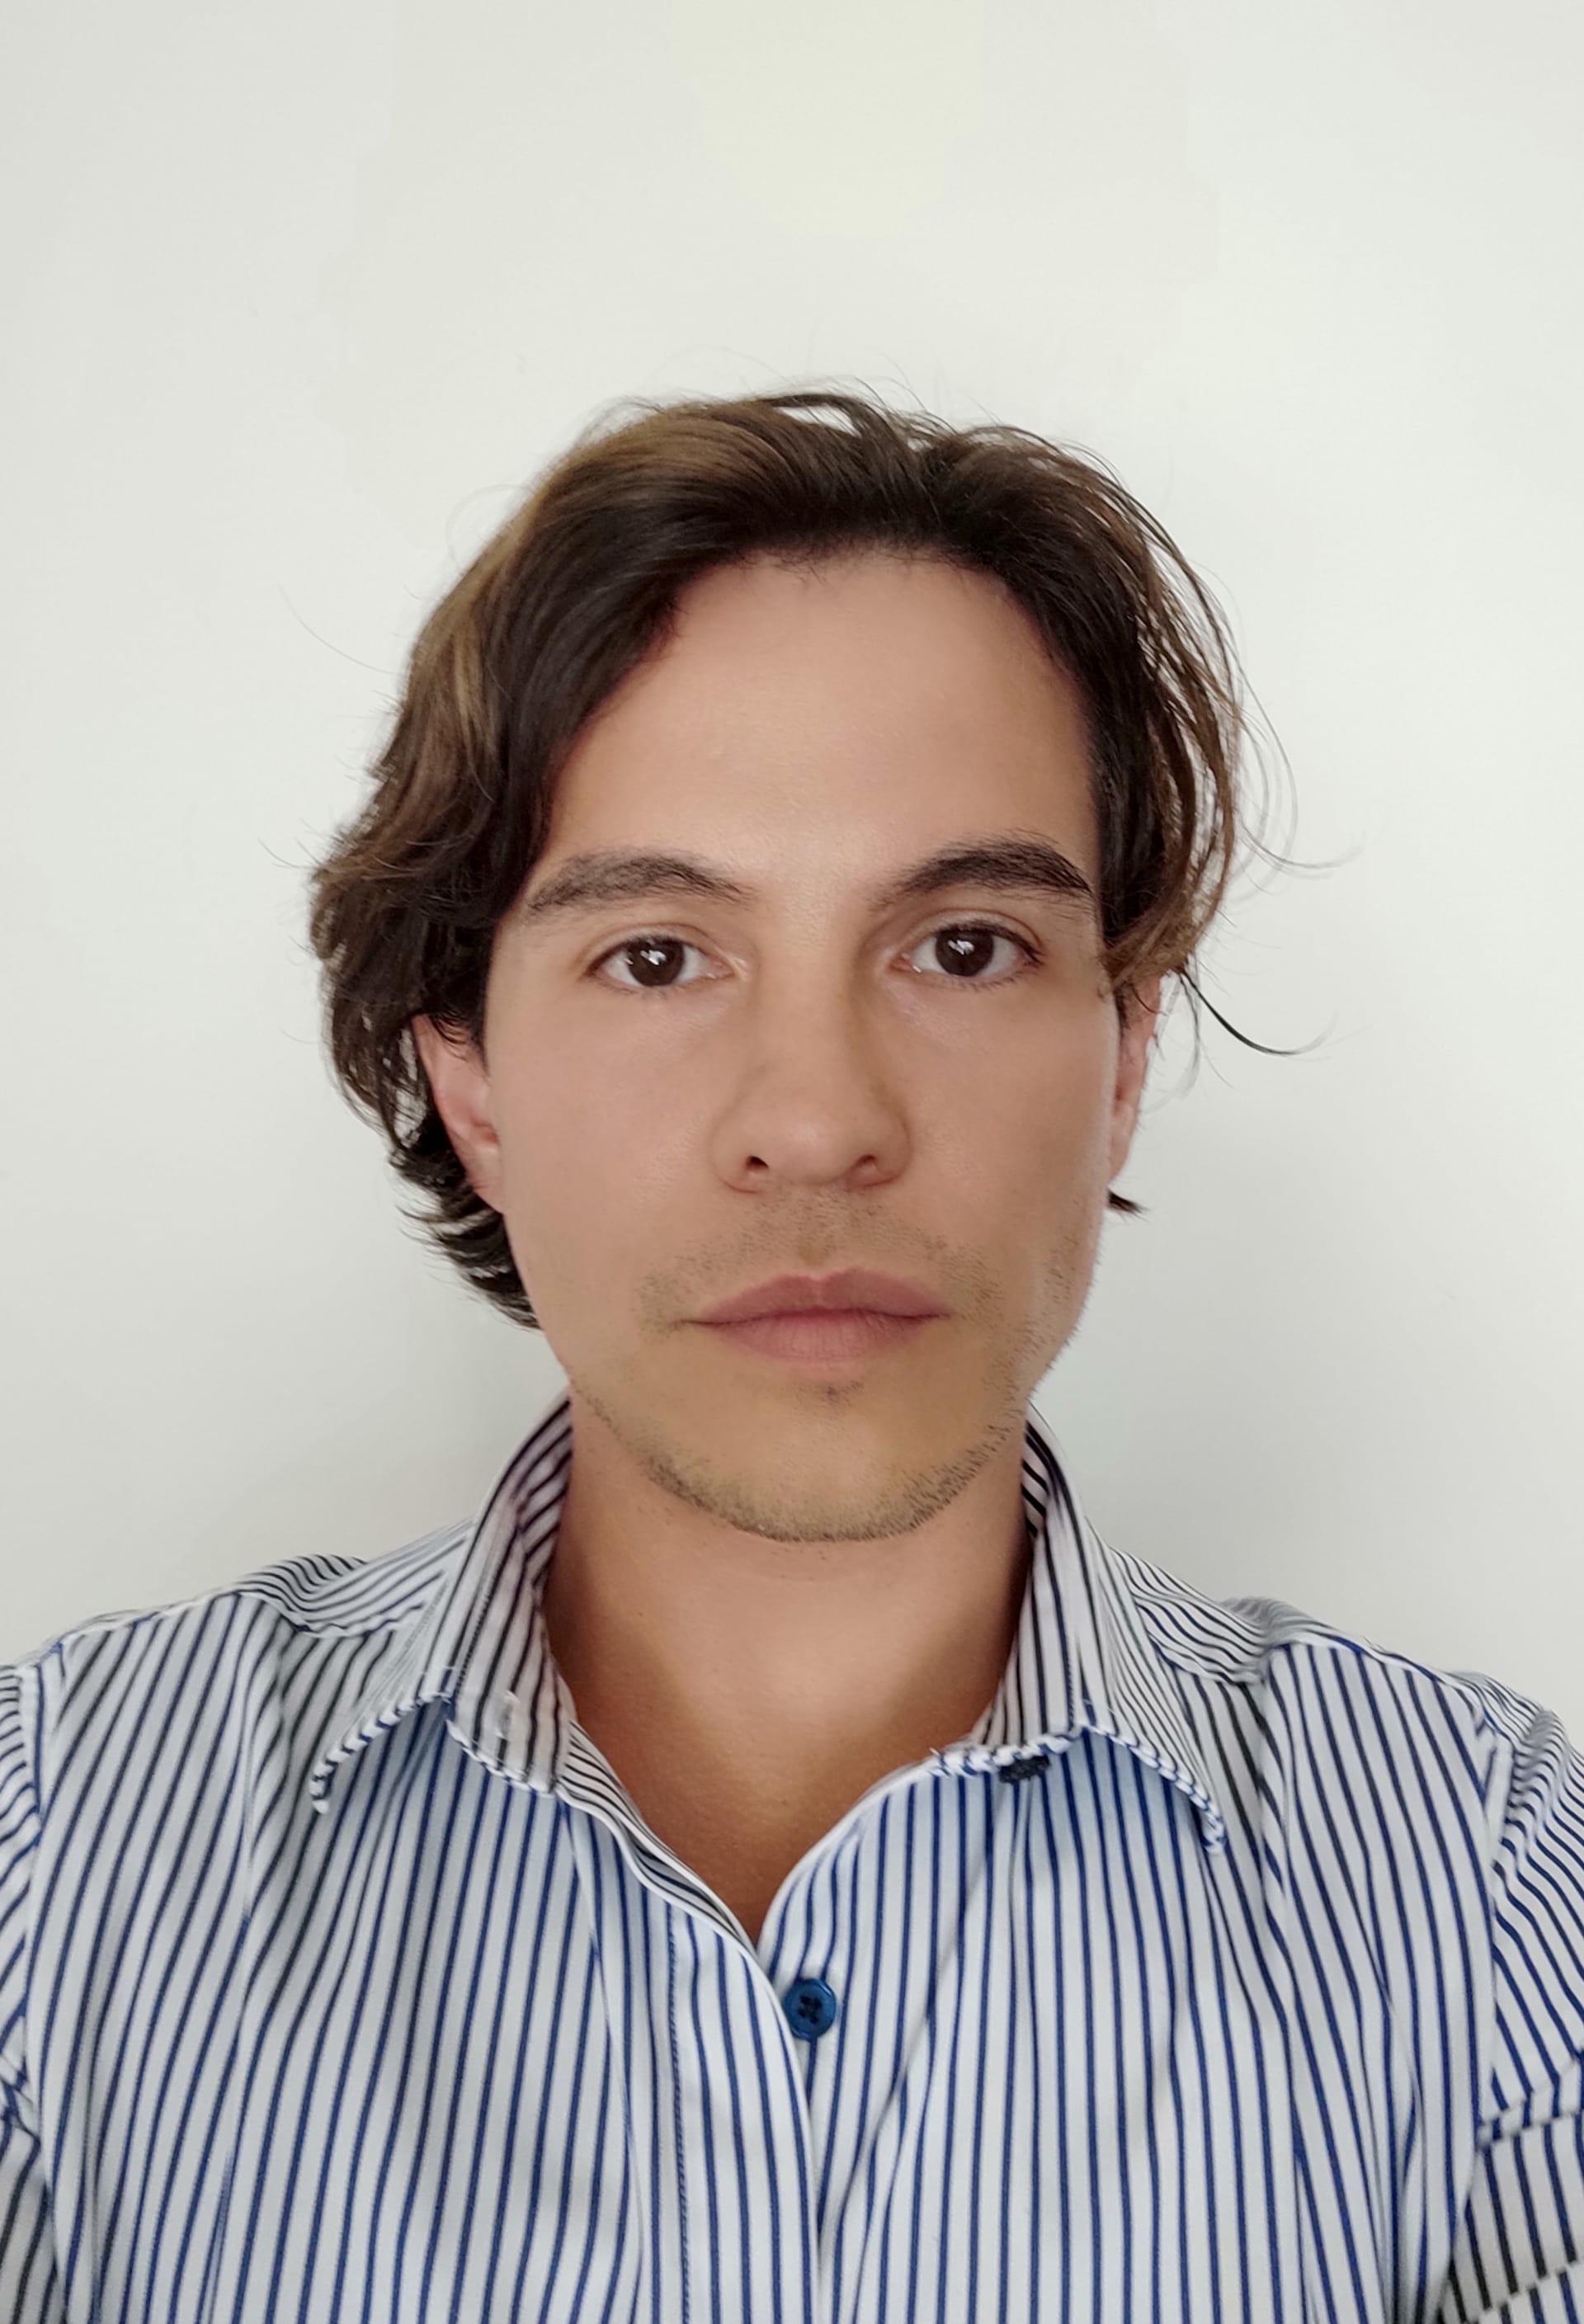 Joaquin Renero